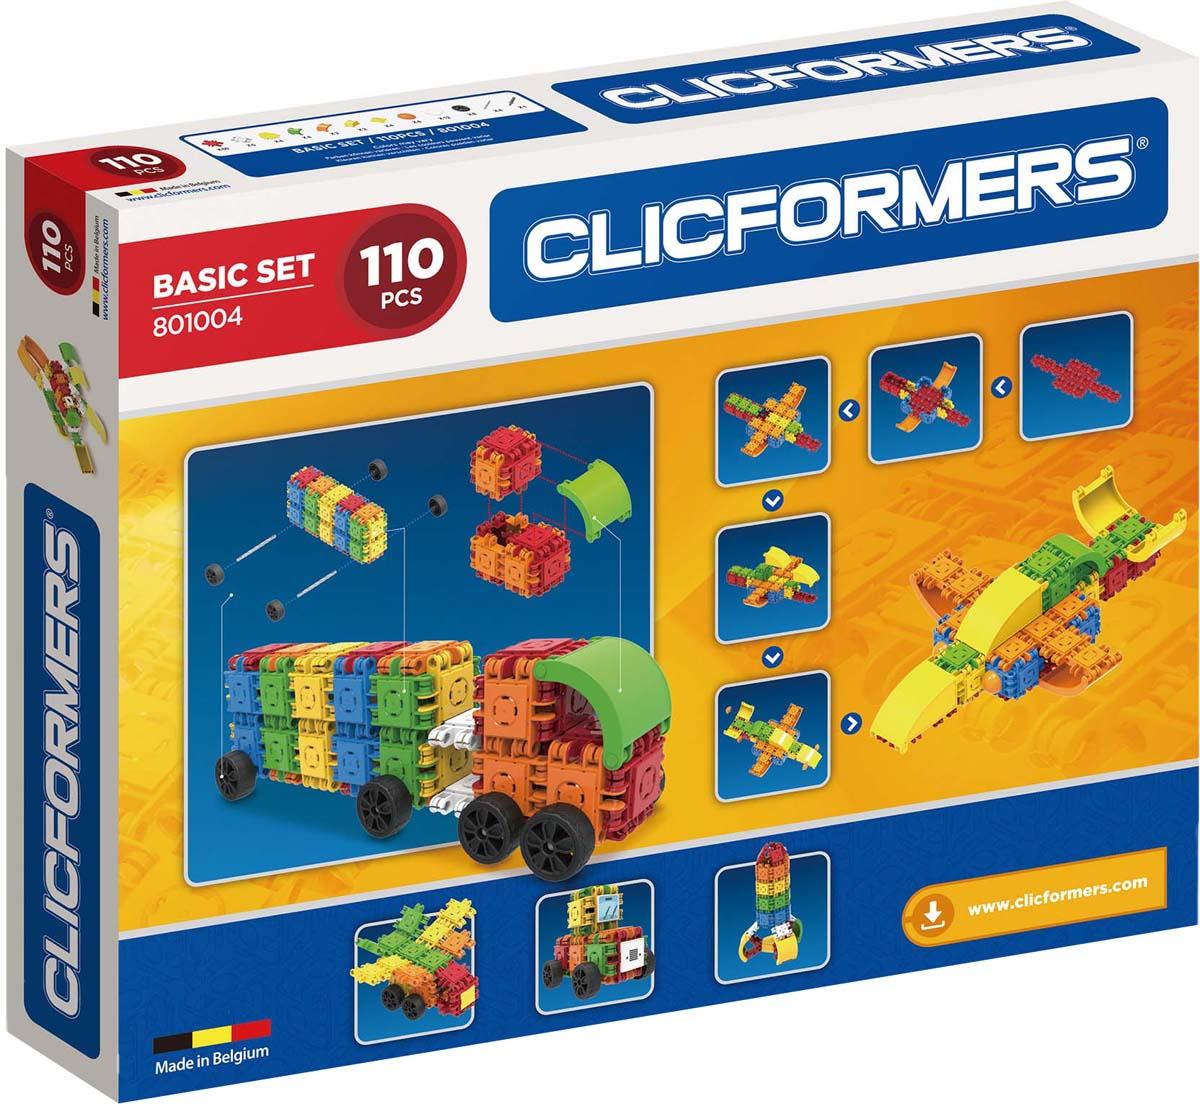 Clicformers Конструктор Basic Set 110 деталей clicformers конструктор clicformers transportation set mini 30 деталей